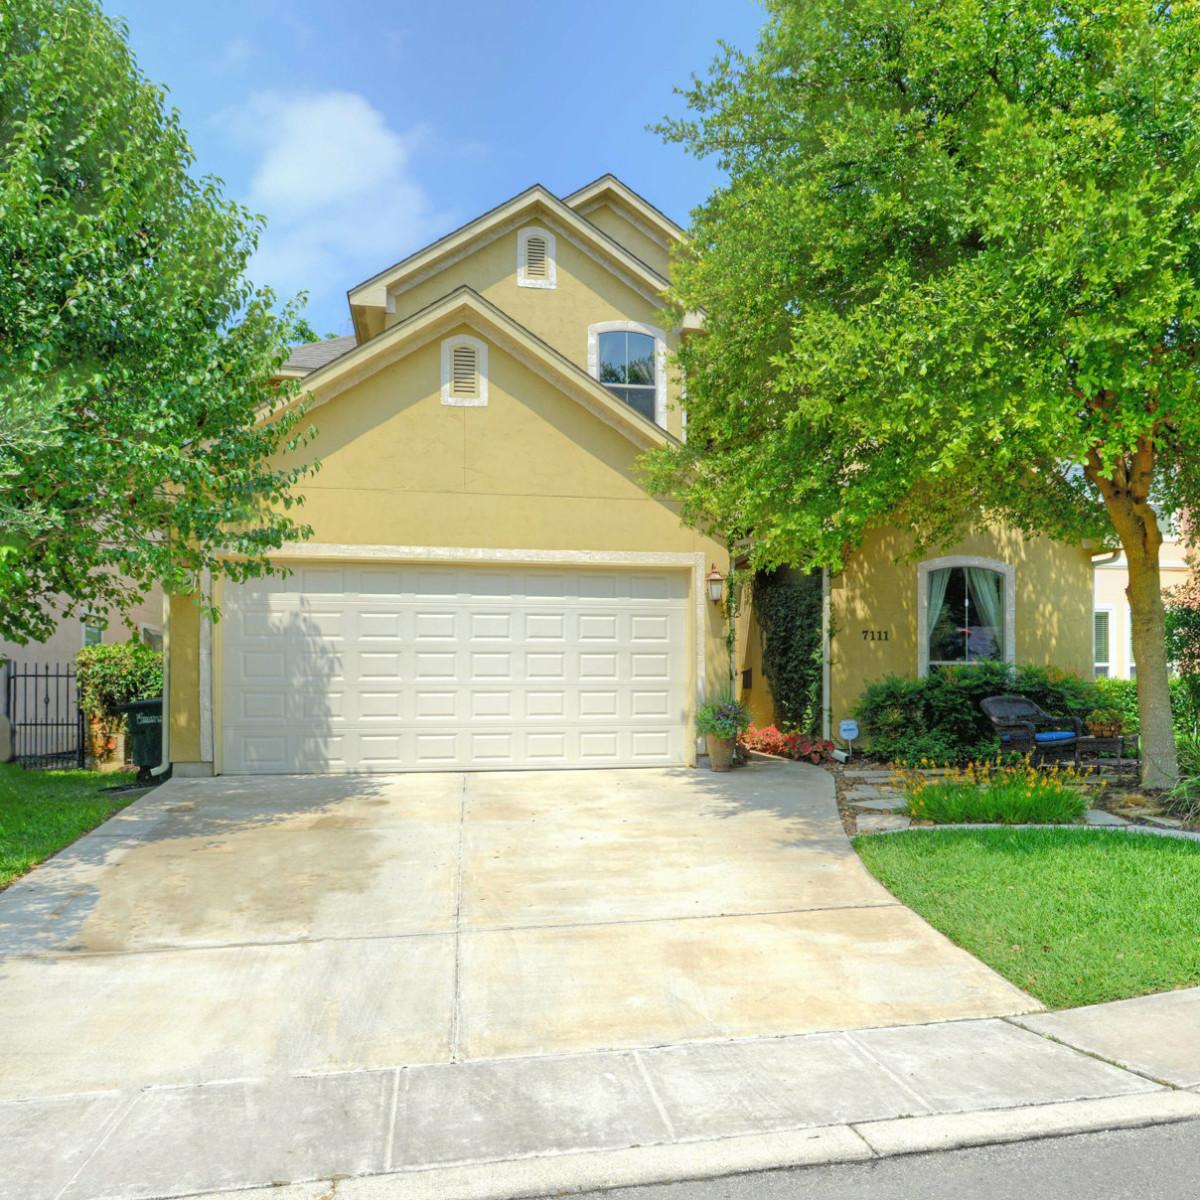 7111 Bethencourt San Antonio house for sale